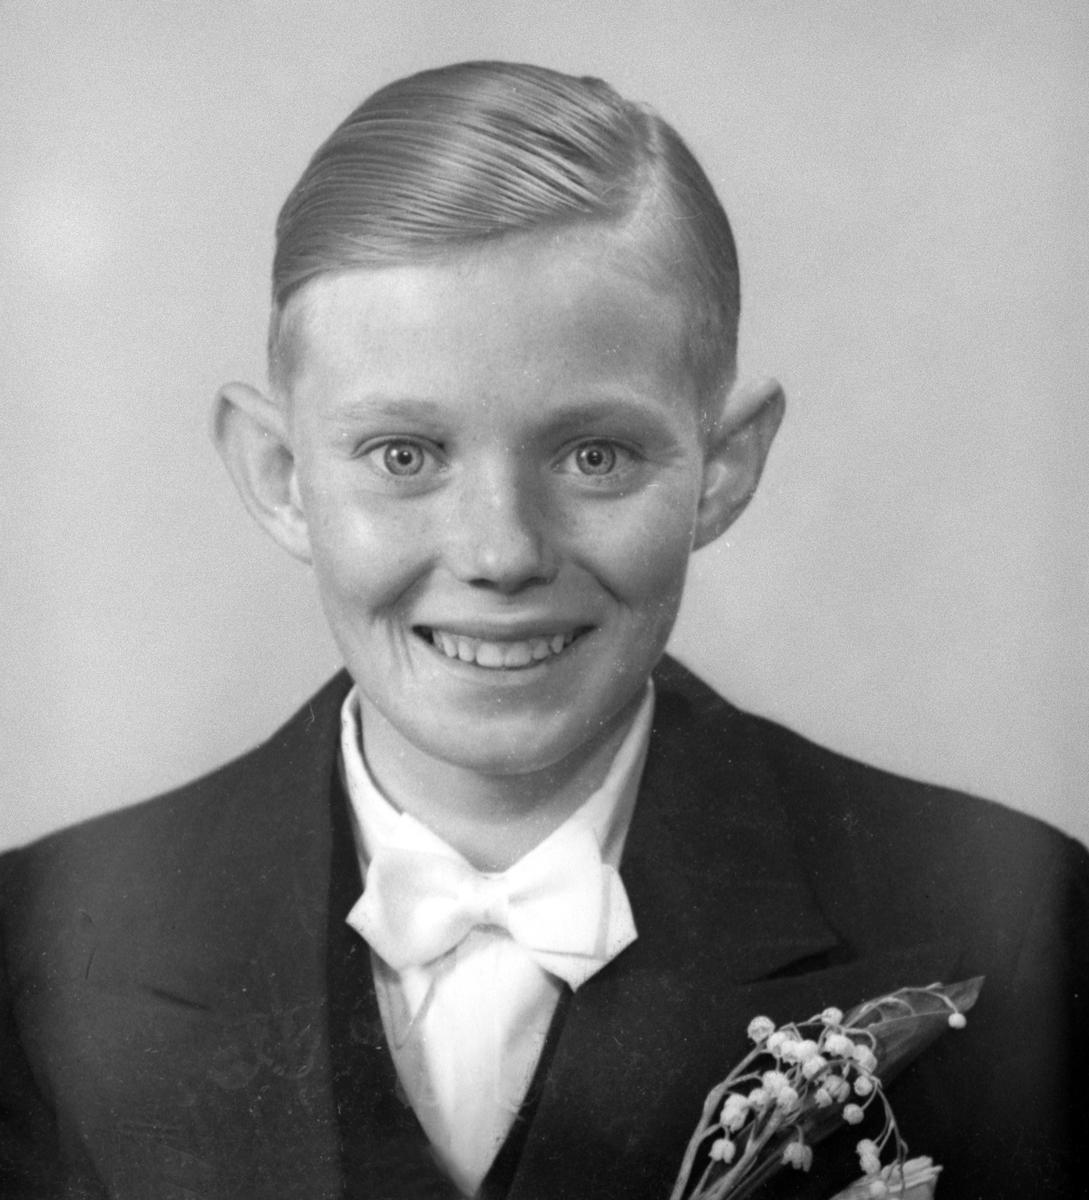 Konfirmanden Vallin. Foto i maj 1940.